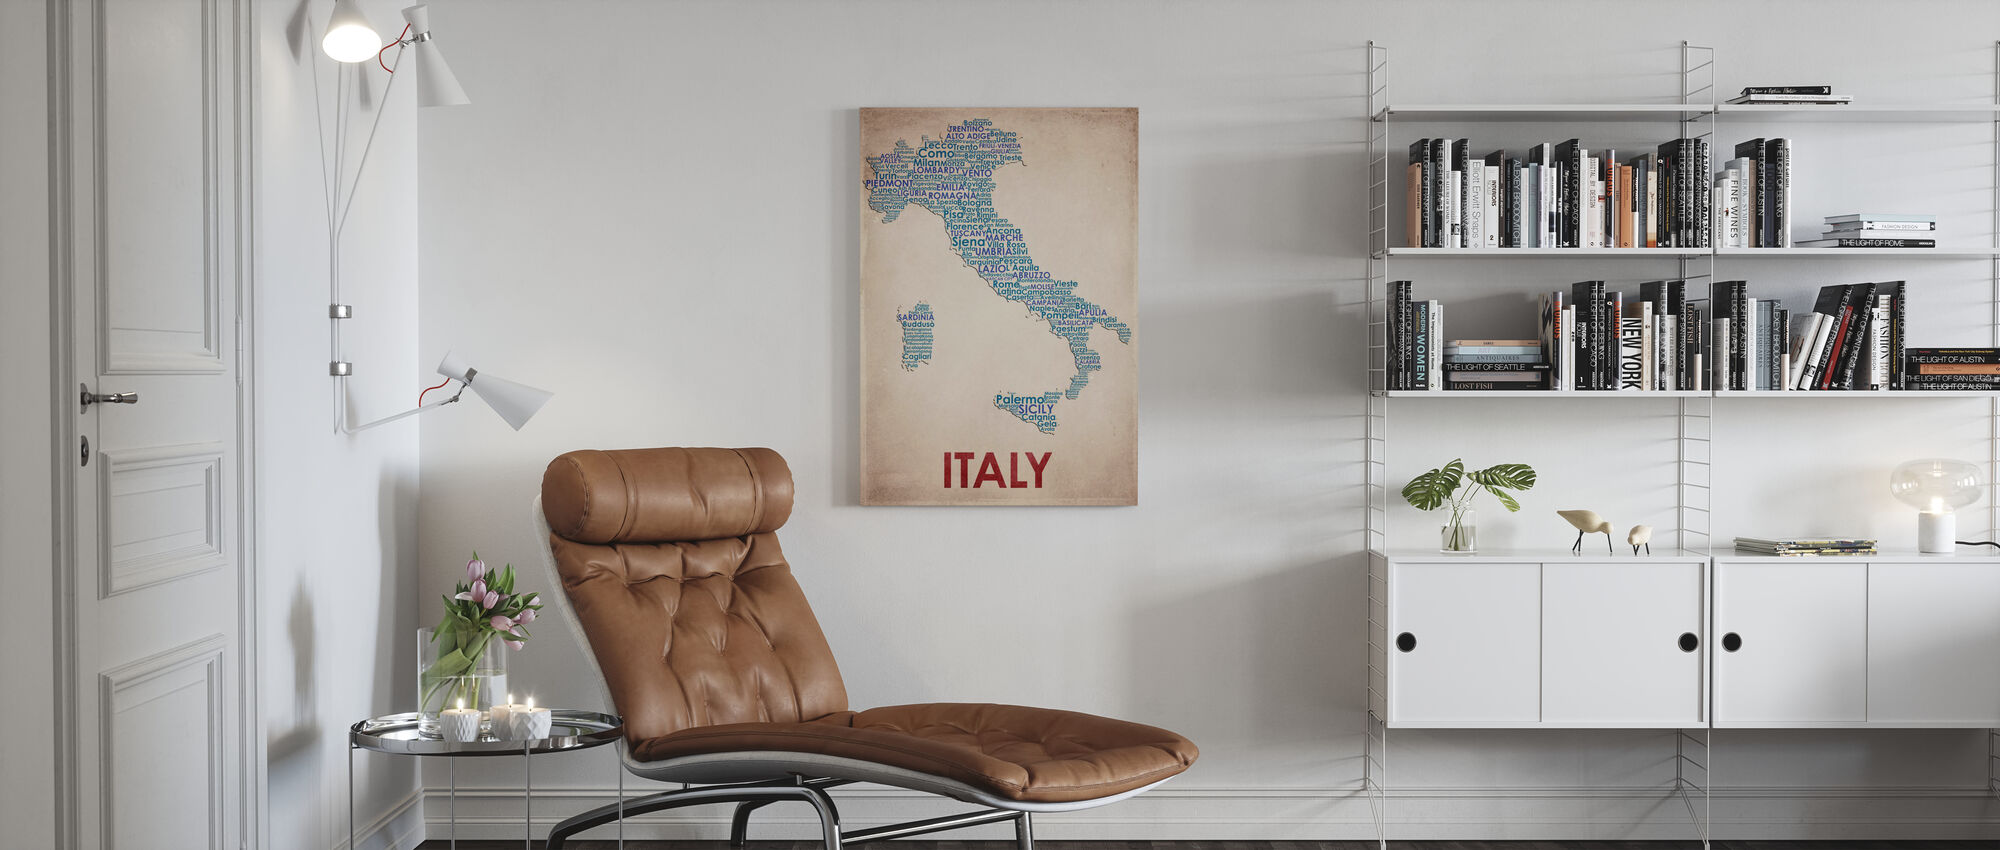 Italia Kartta - Canvastaulu - Olohuone